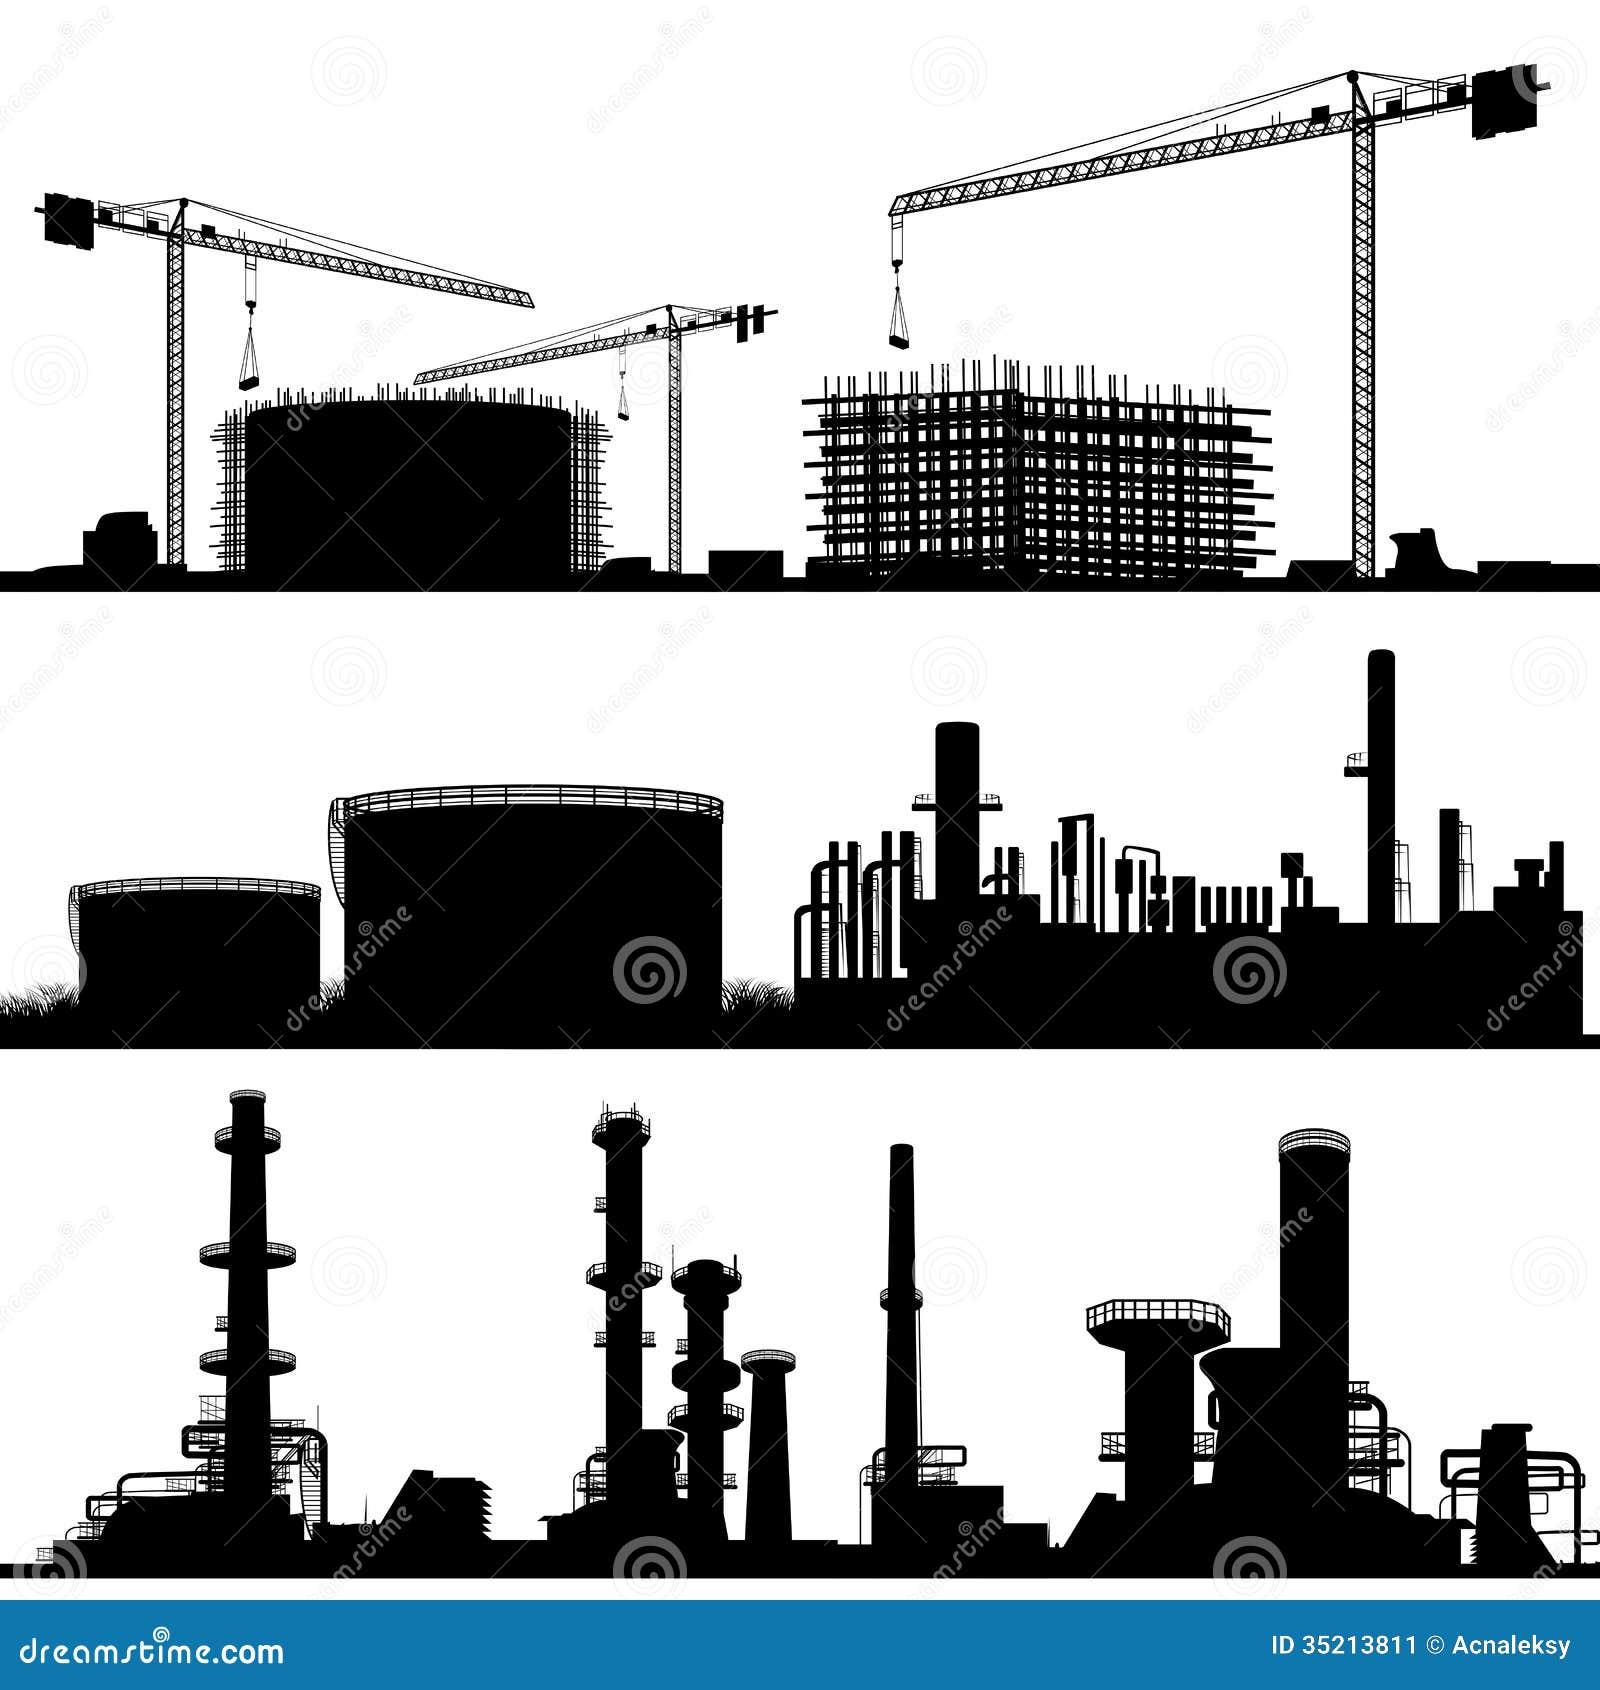 clipart industrial equipment - photo #9